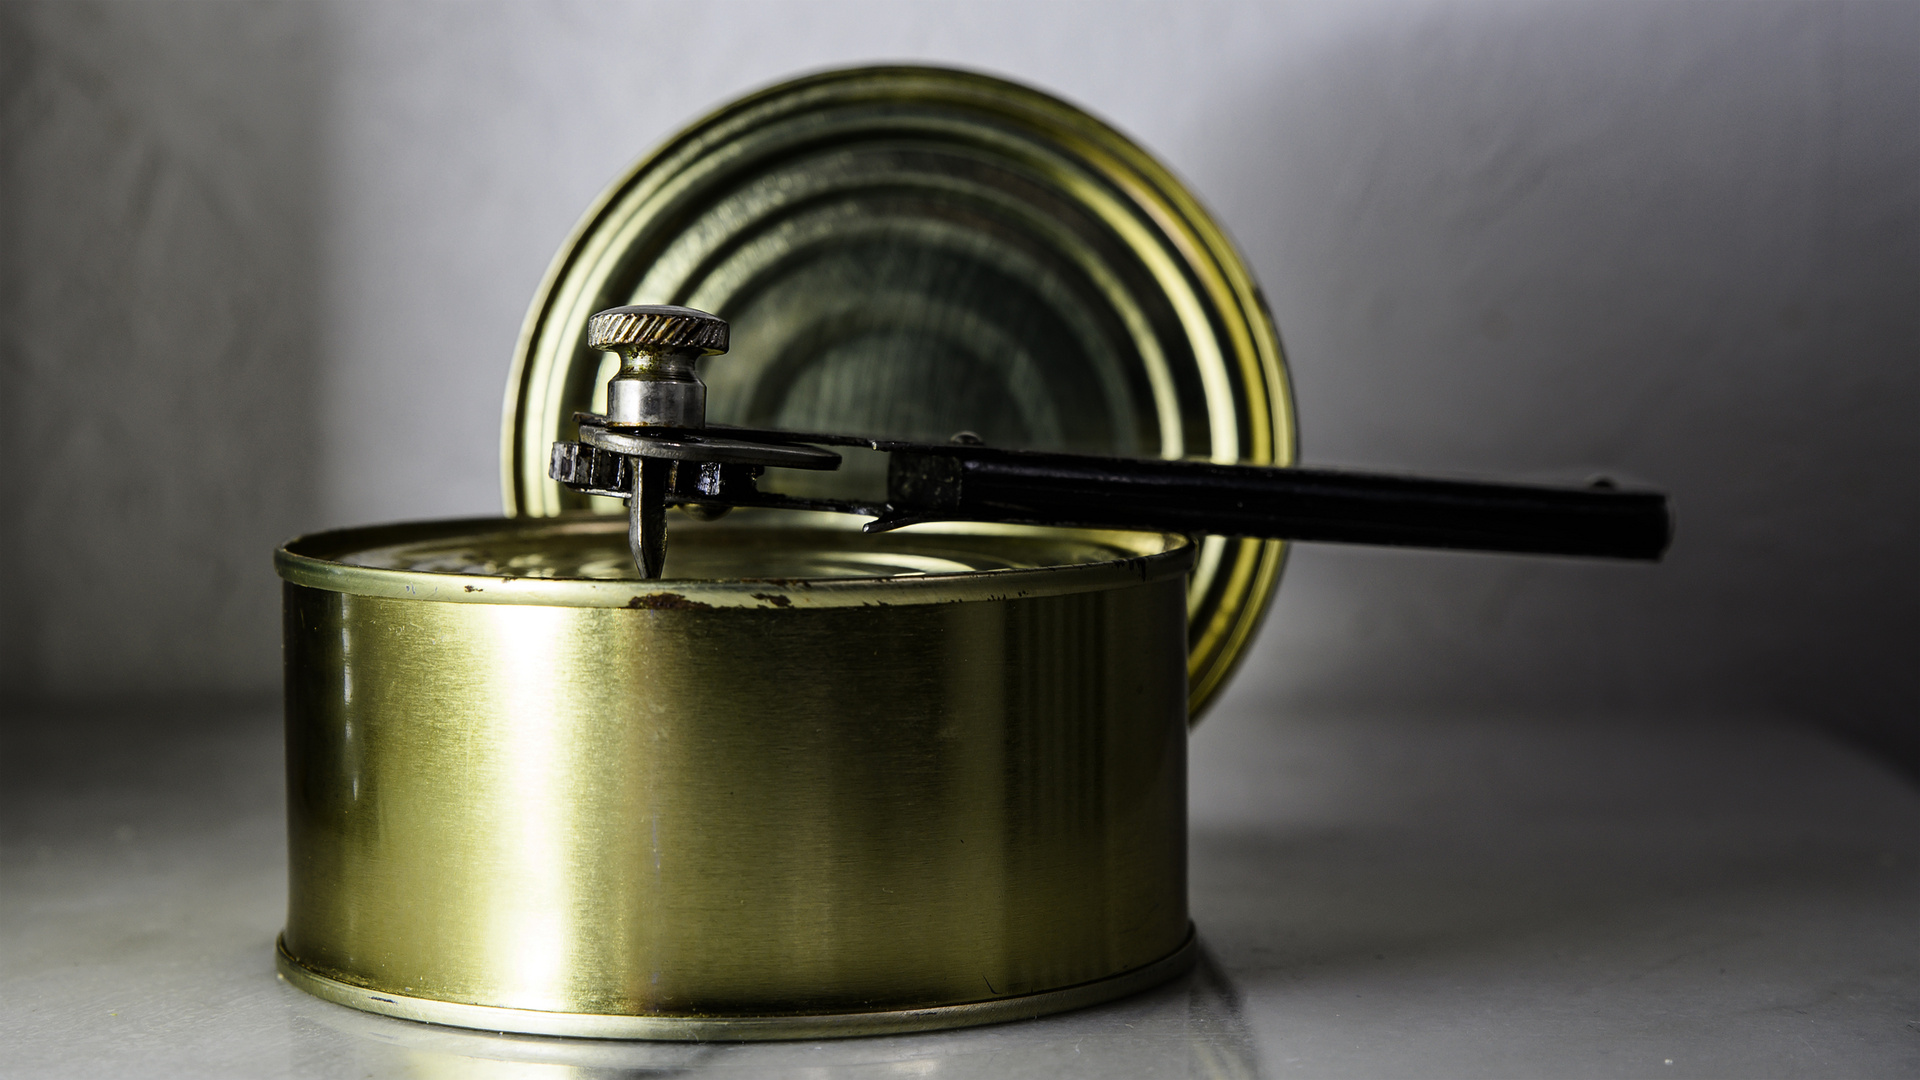 Der Dosenöffner - l'ouvre-boîte